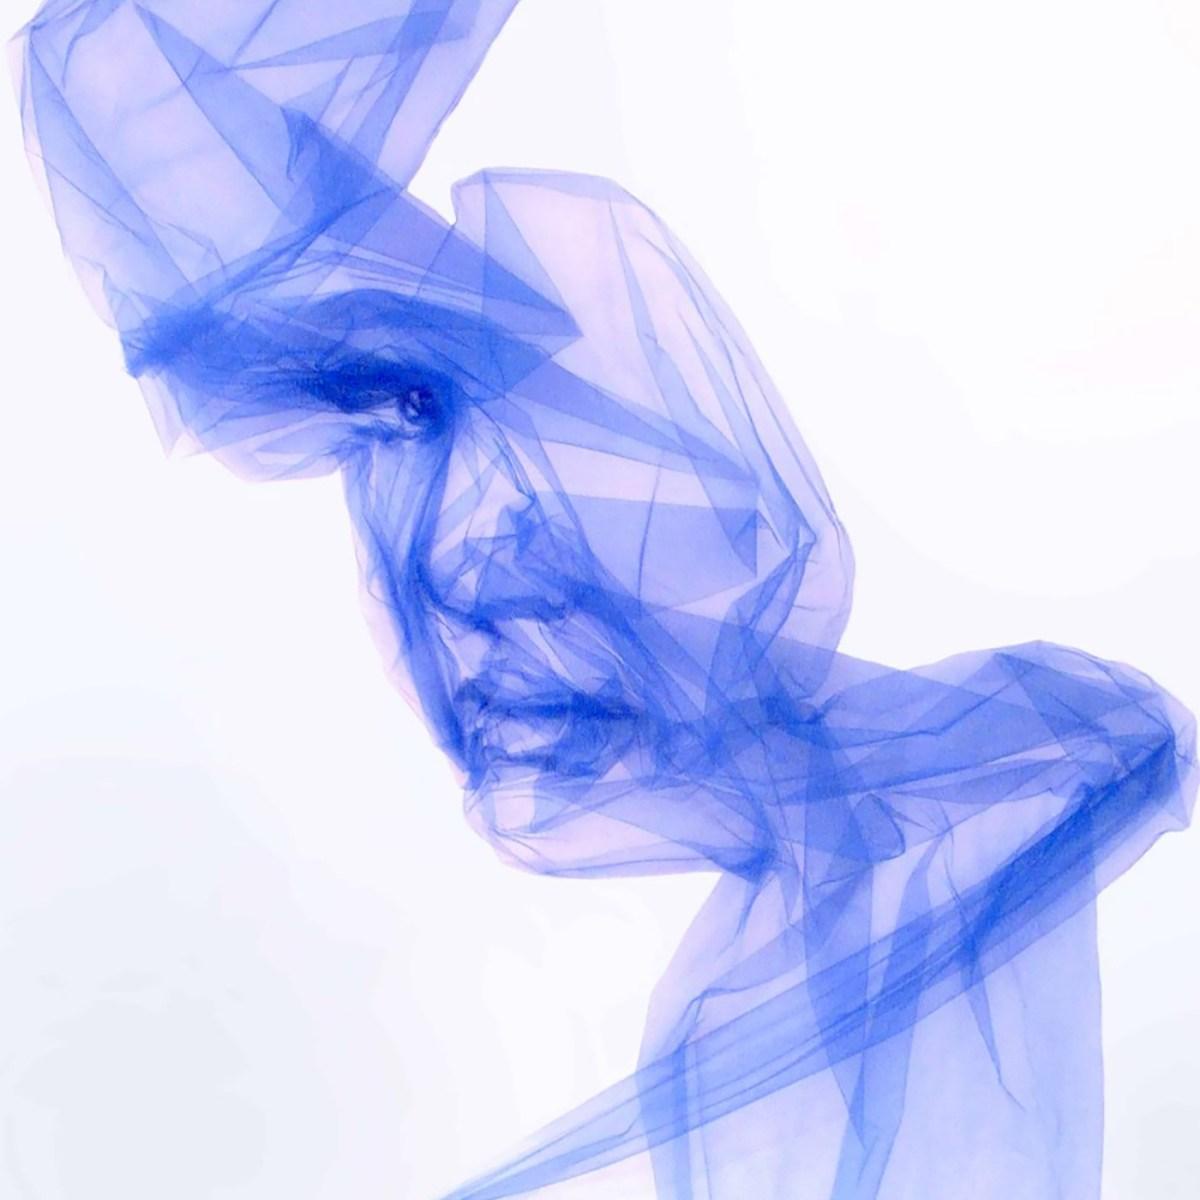 art-benjamin-shine-08